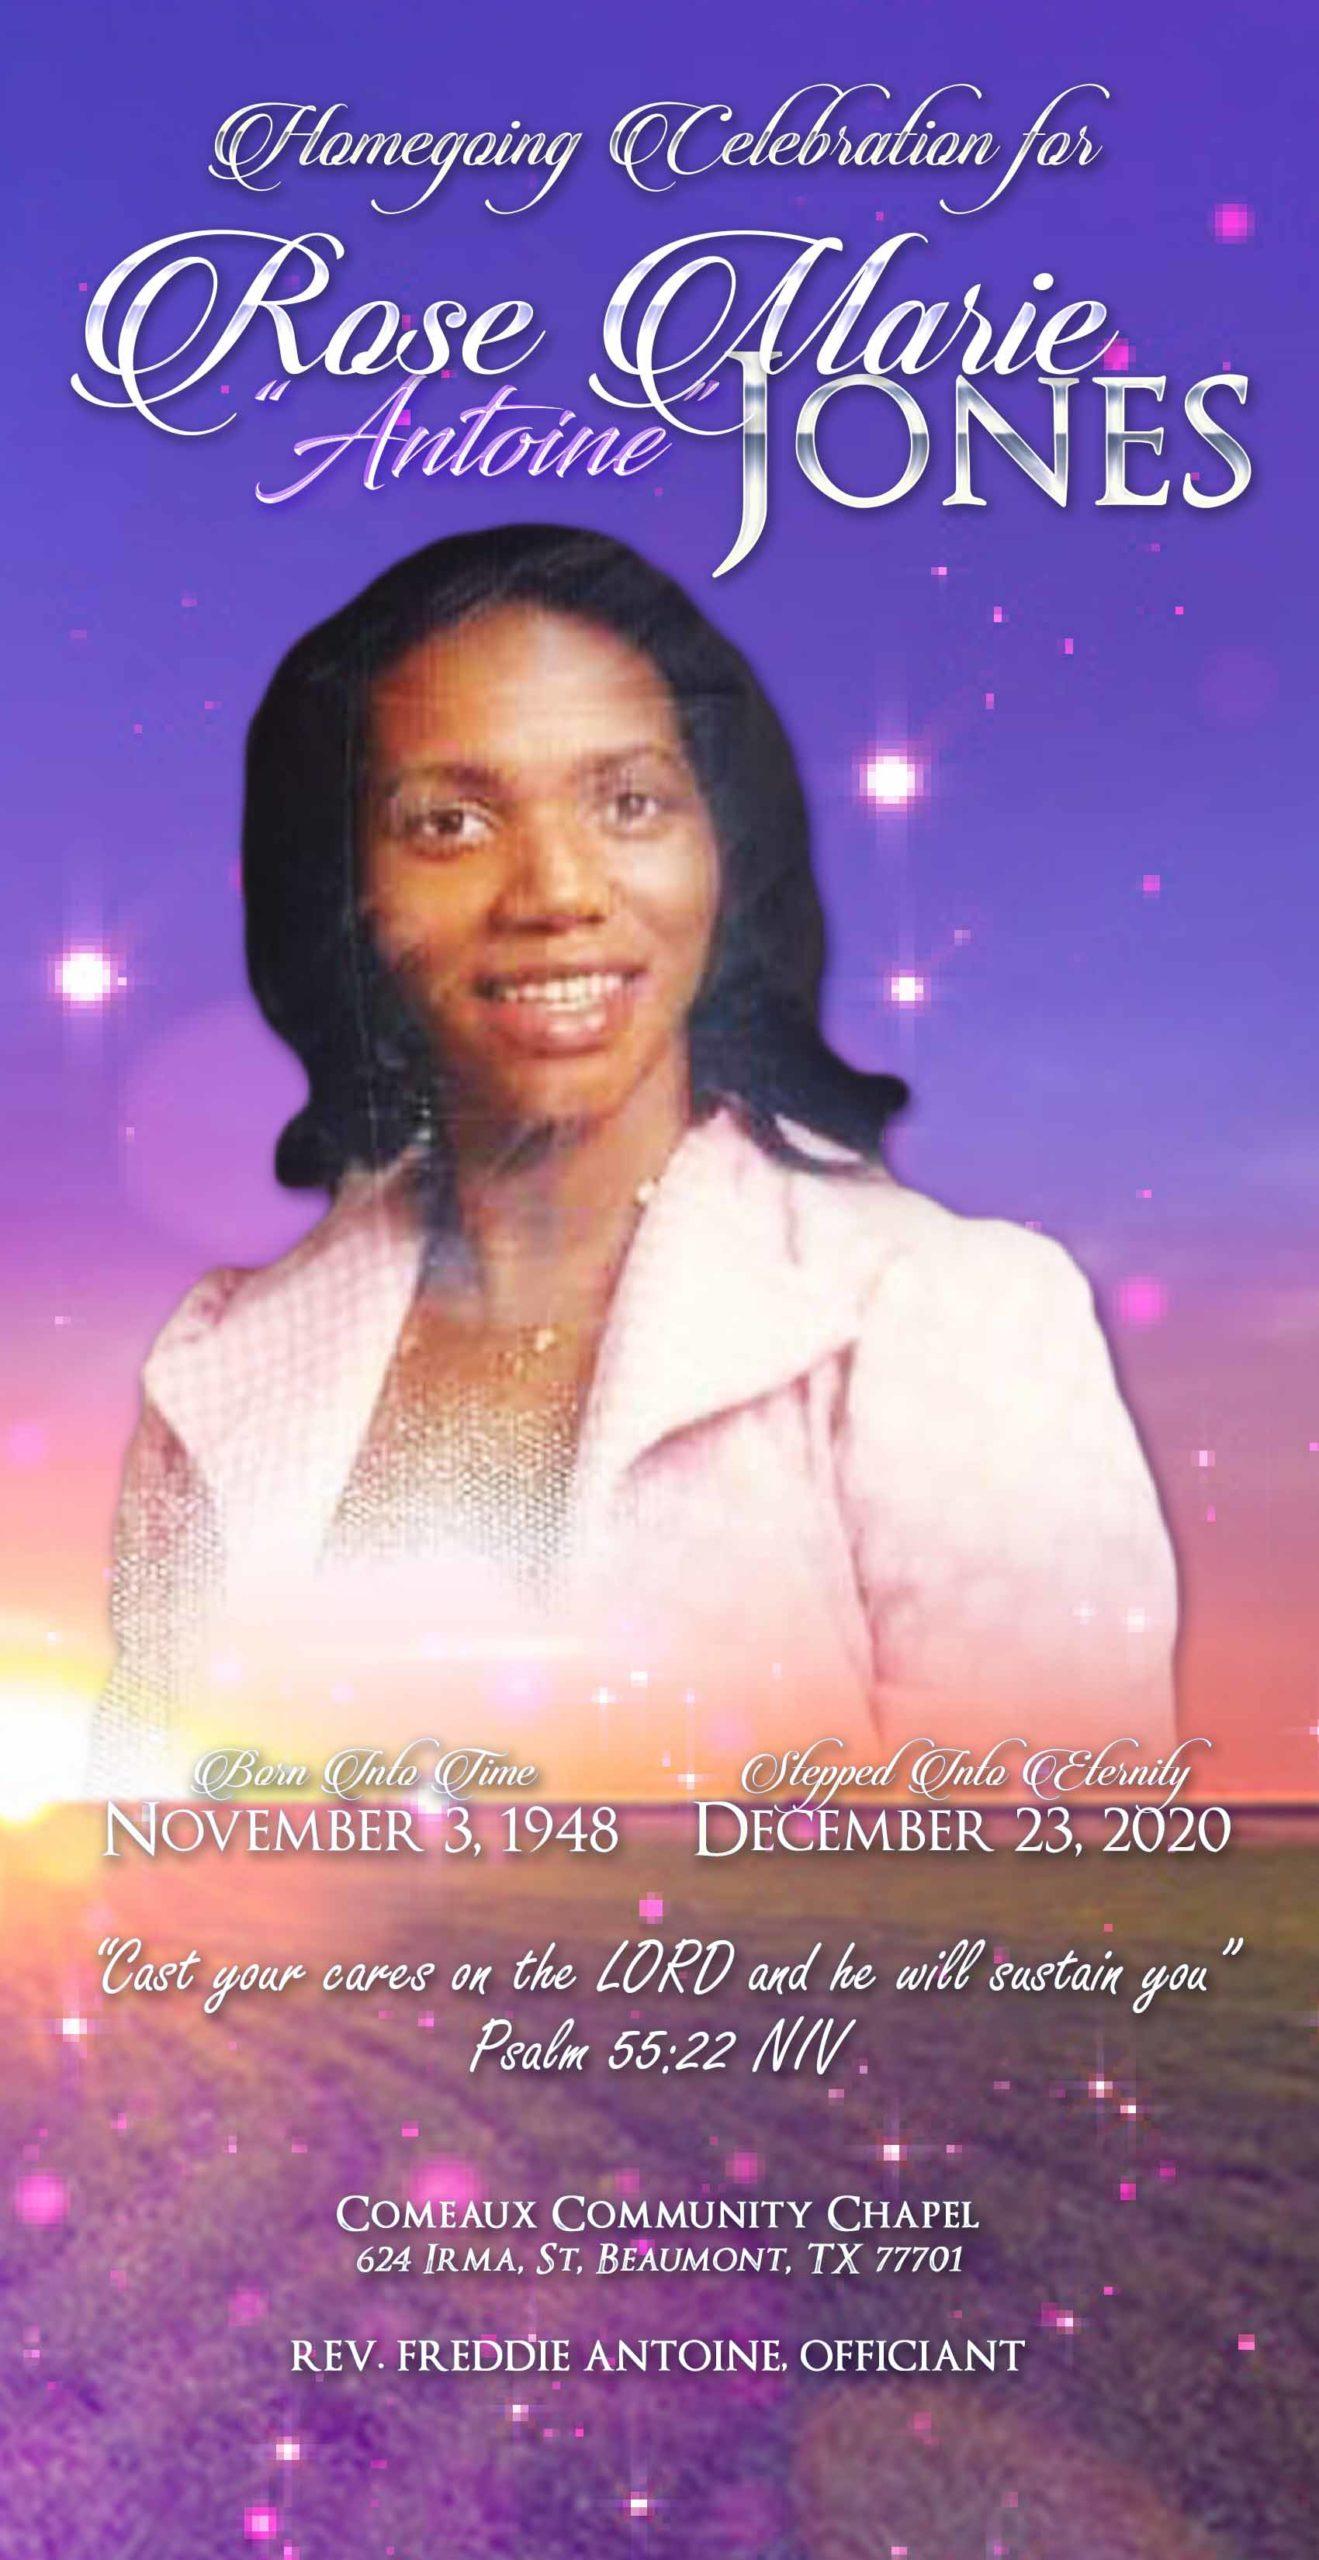 Rose Marie Jones 1948-2021